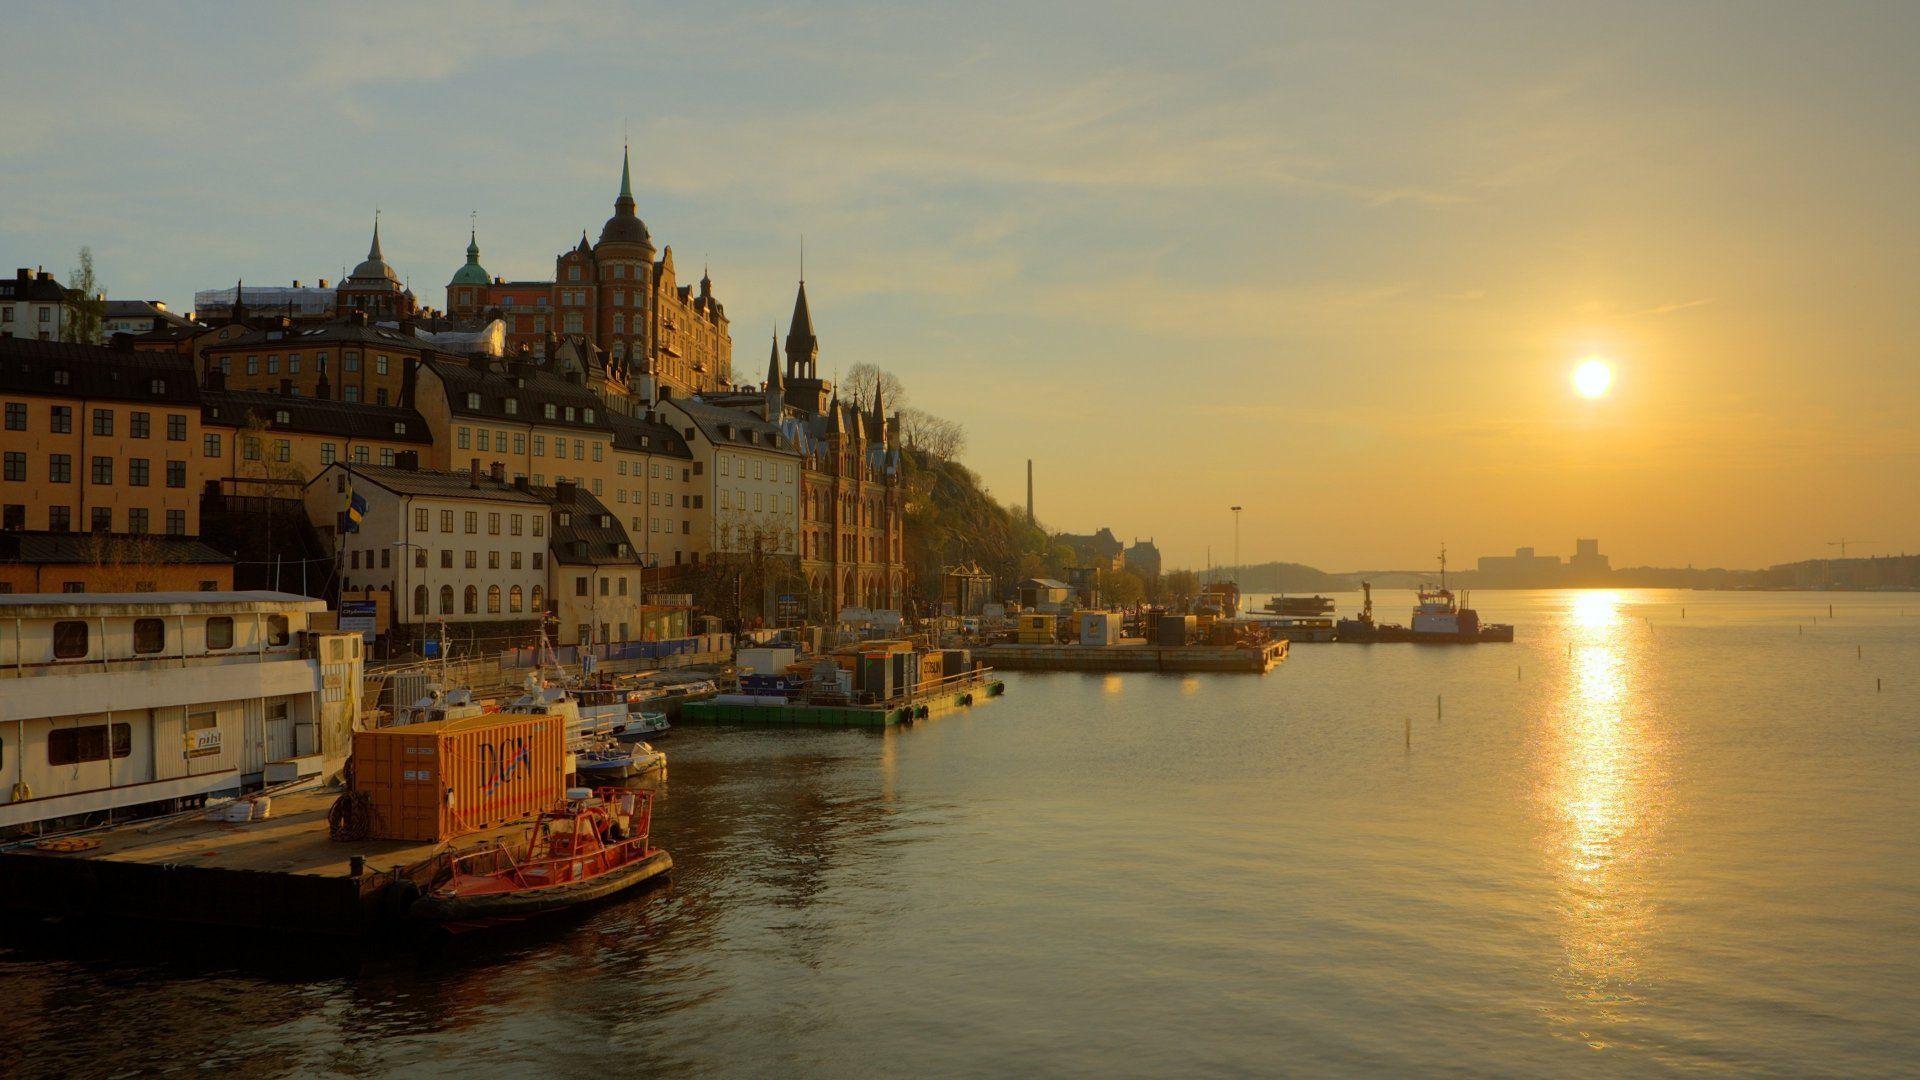 _sweden_stockholm_promenade_river_sun_sunrise_fog_gold_houses_towers_water_boat_reflection_sky...jpg